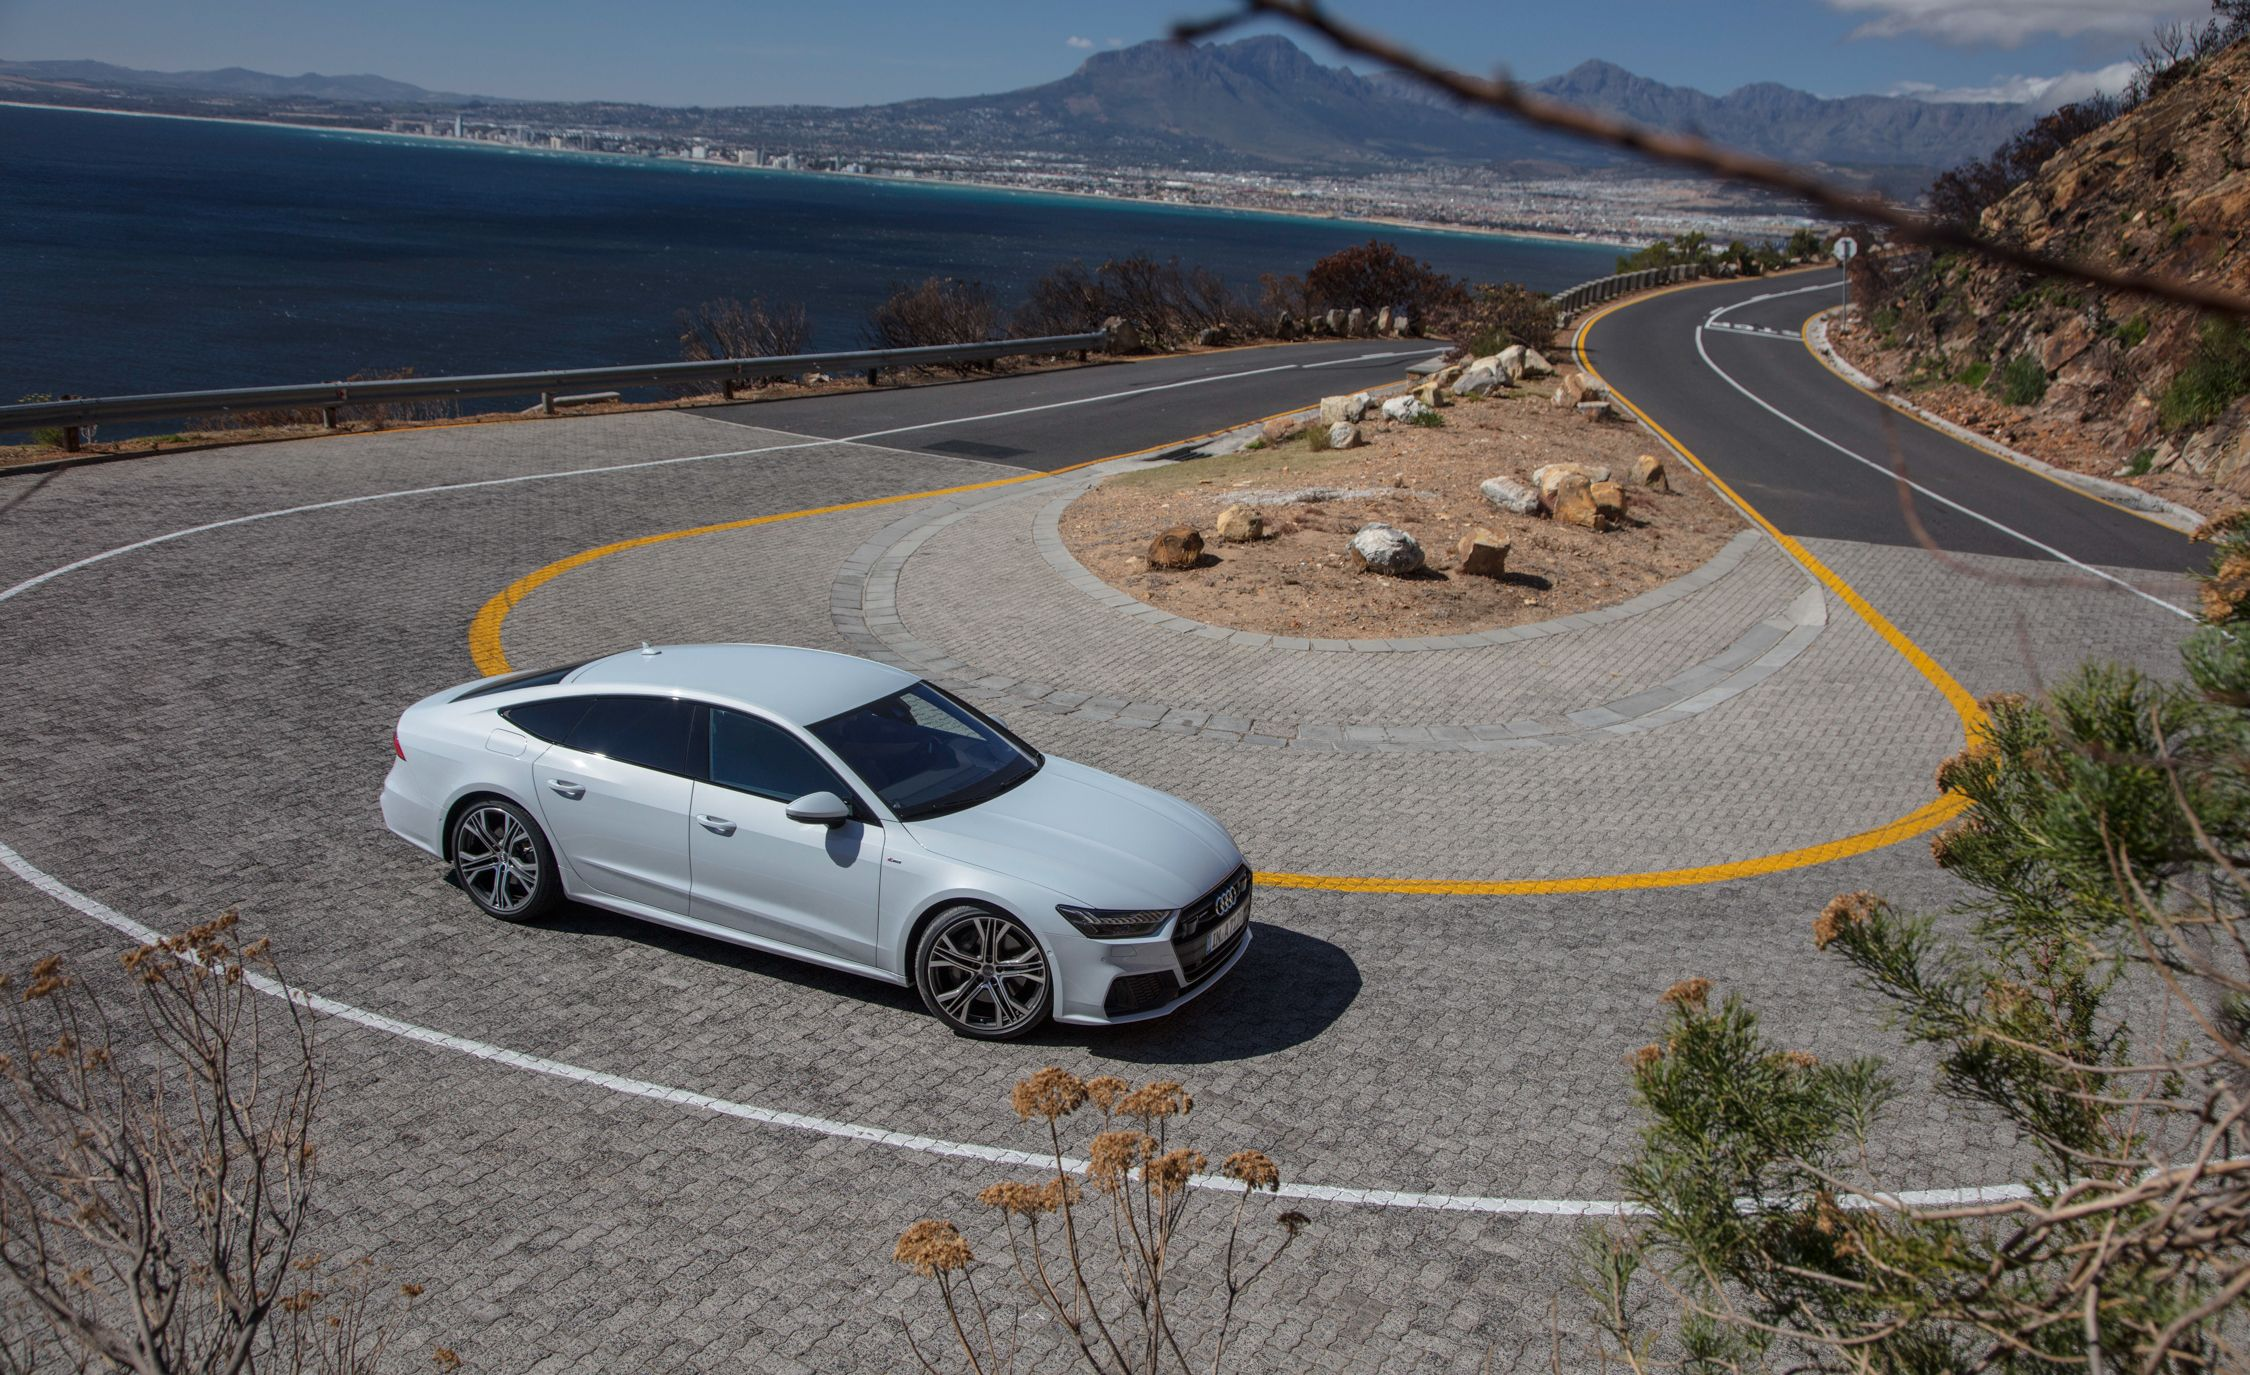 2019-Audi-A7-Sportback-194-1.jpg